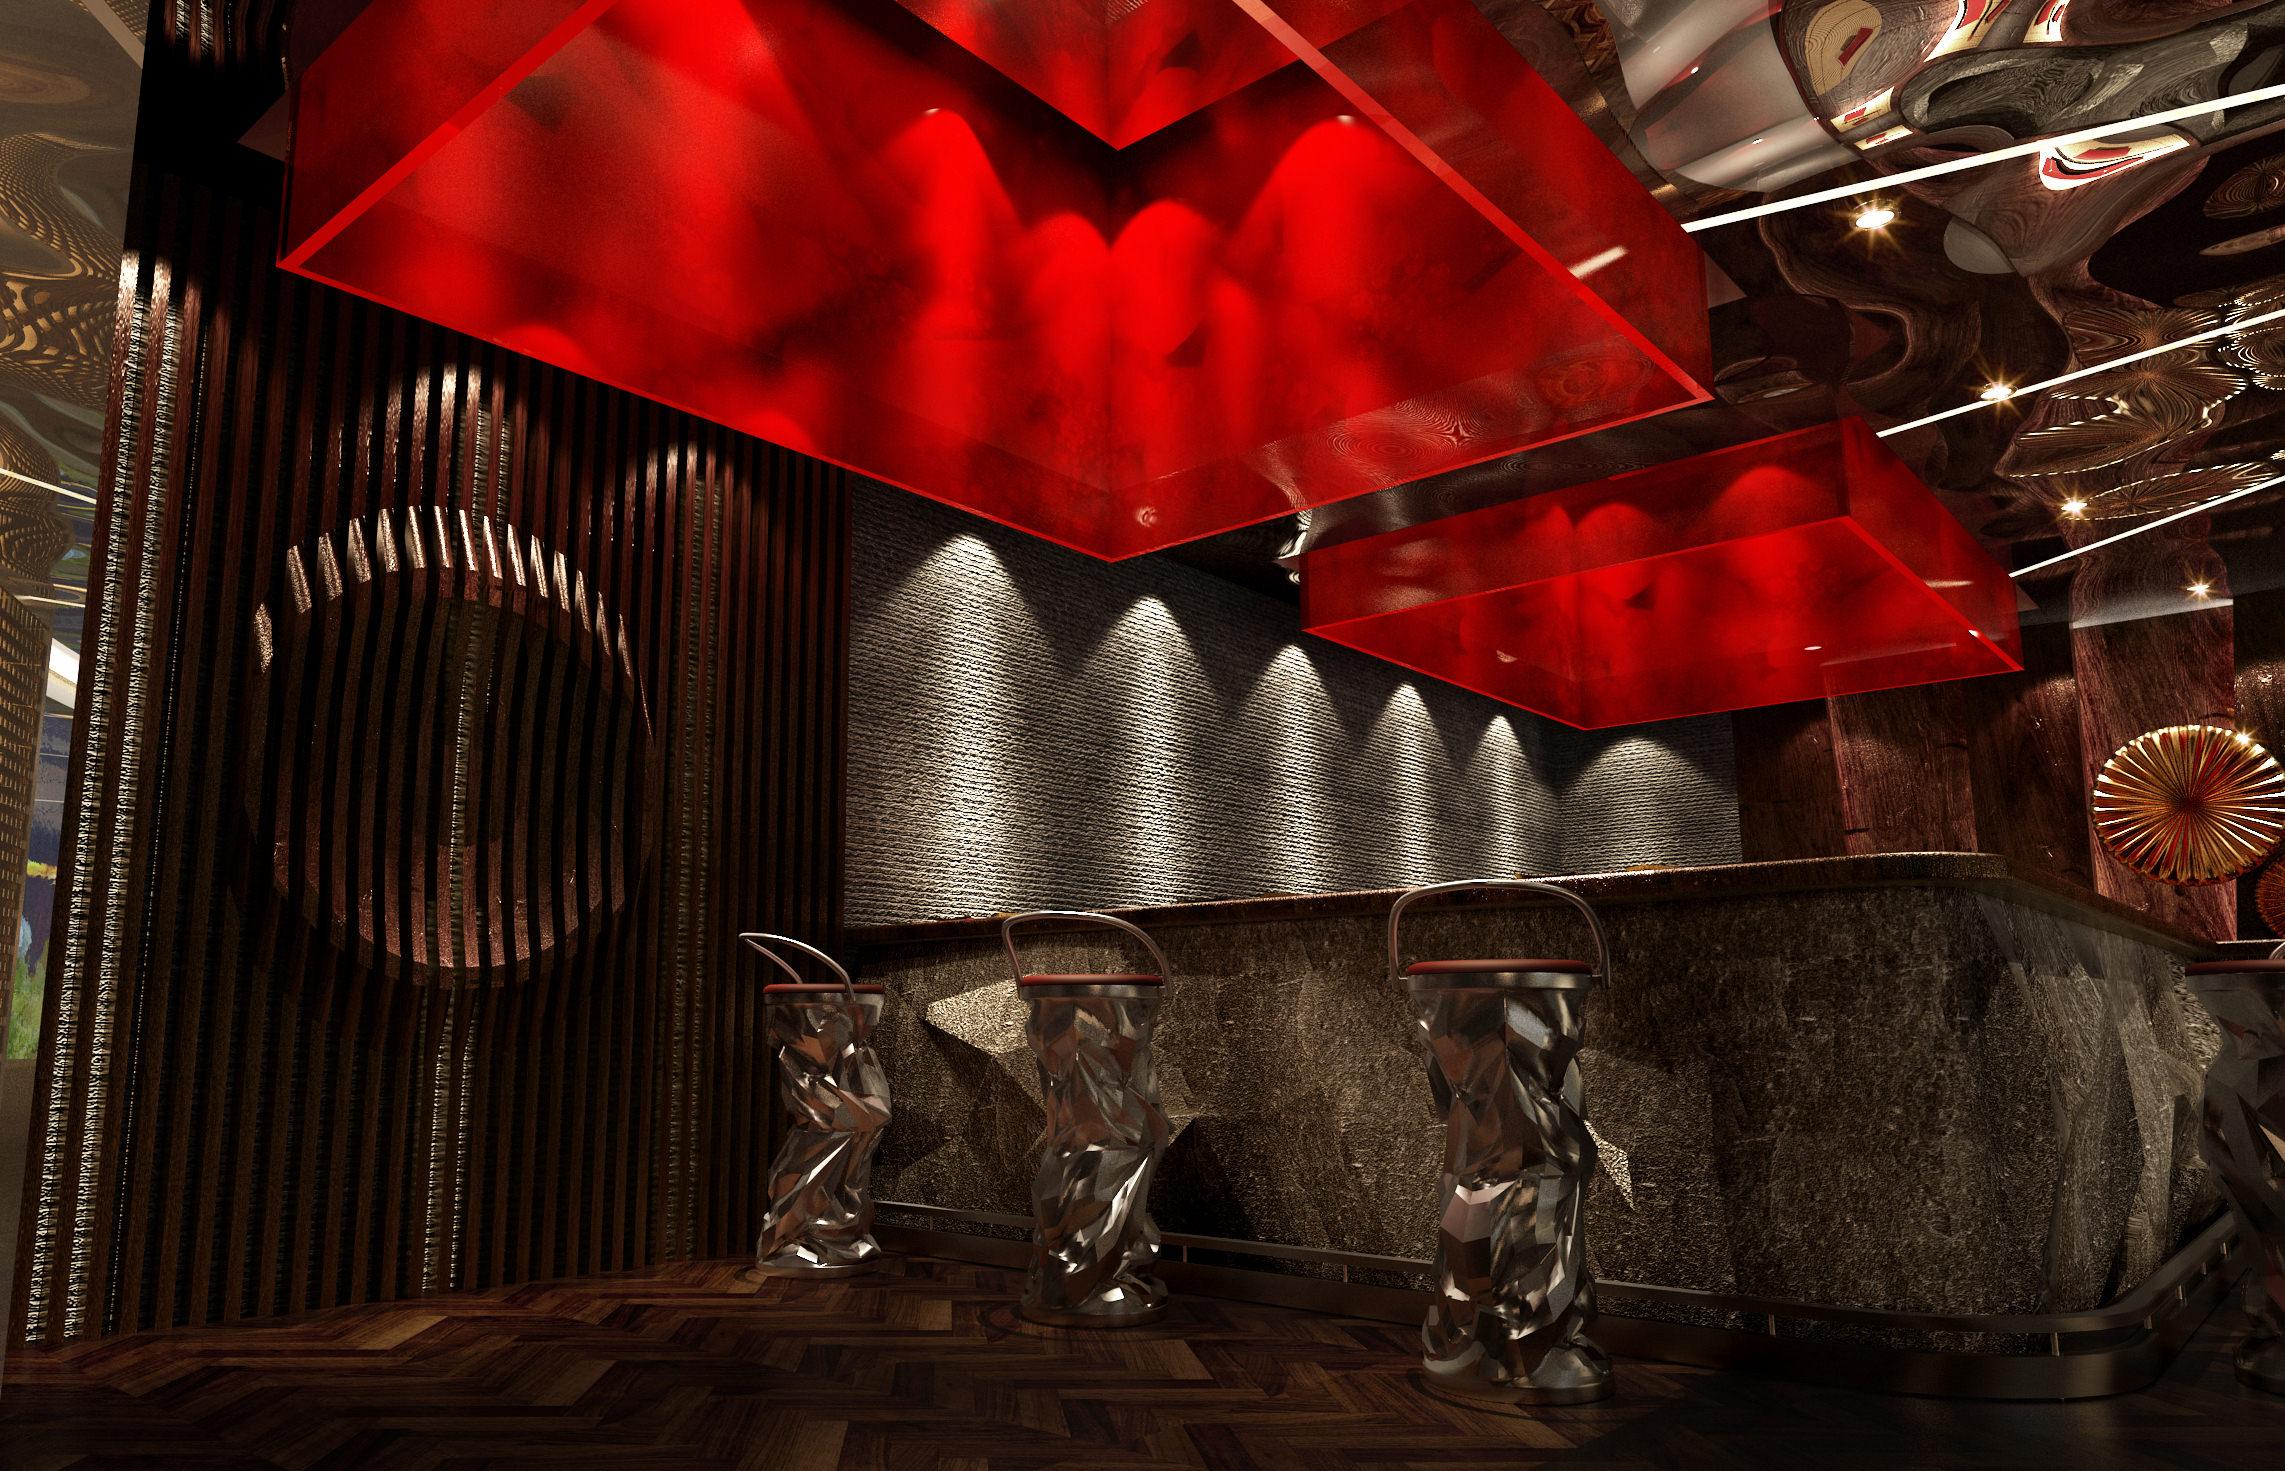 Restaurant Wall Decor 3d model restaurant with high-end wall decor | cgtrader